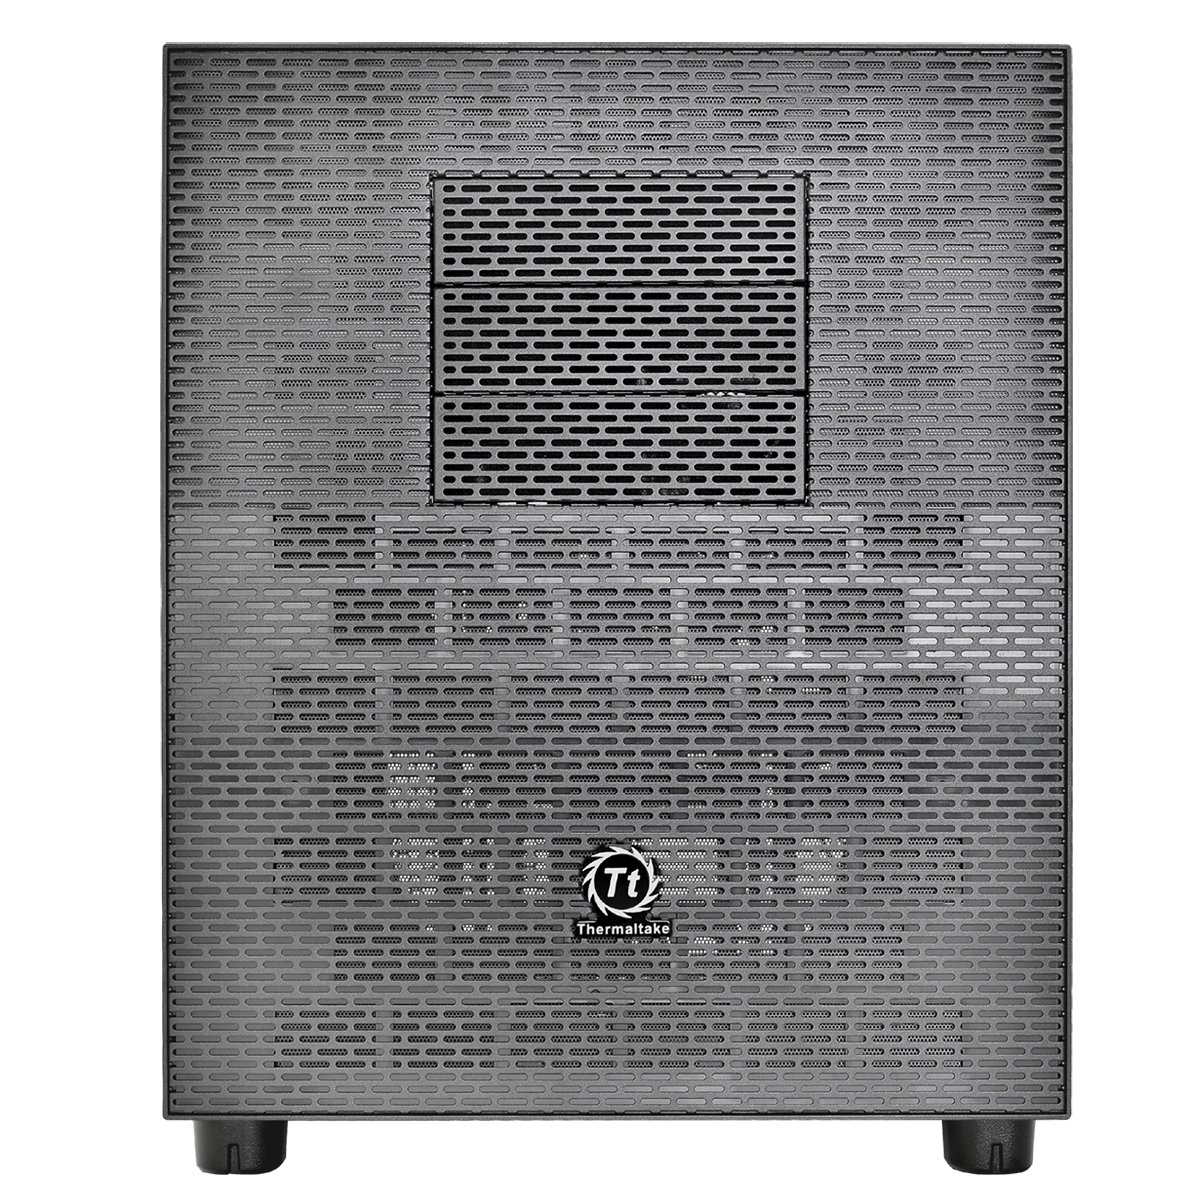 Thermaltake Core X5 - Caja de Ordenador (Cubo, PC, SGCC, ATX, EATX, Micro-ATX, Mini-ITX, Negro, Fondo): Amazon.es: Informática